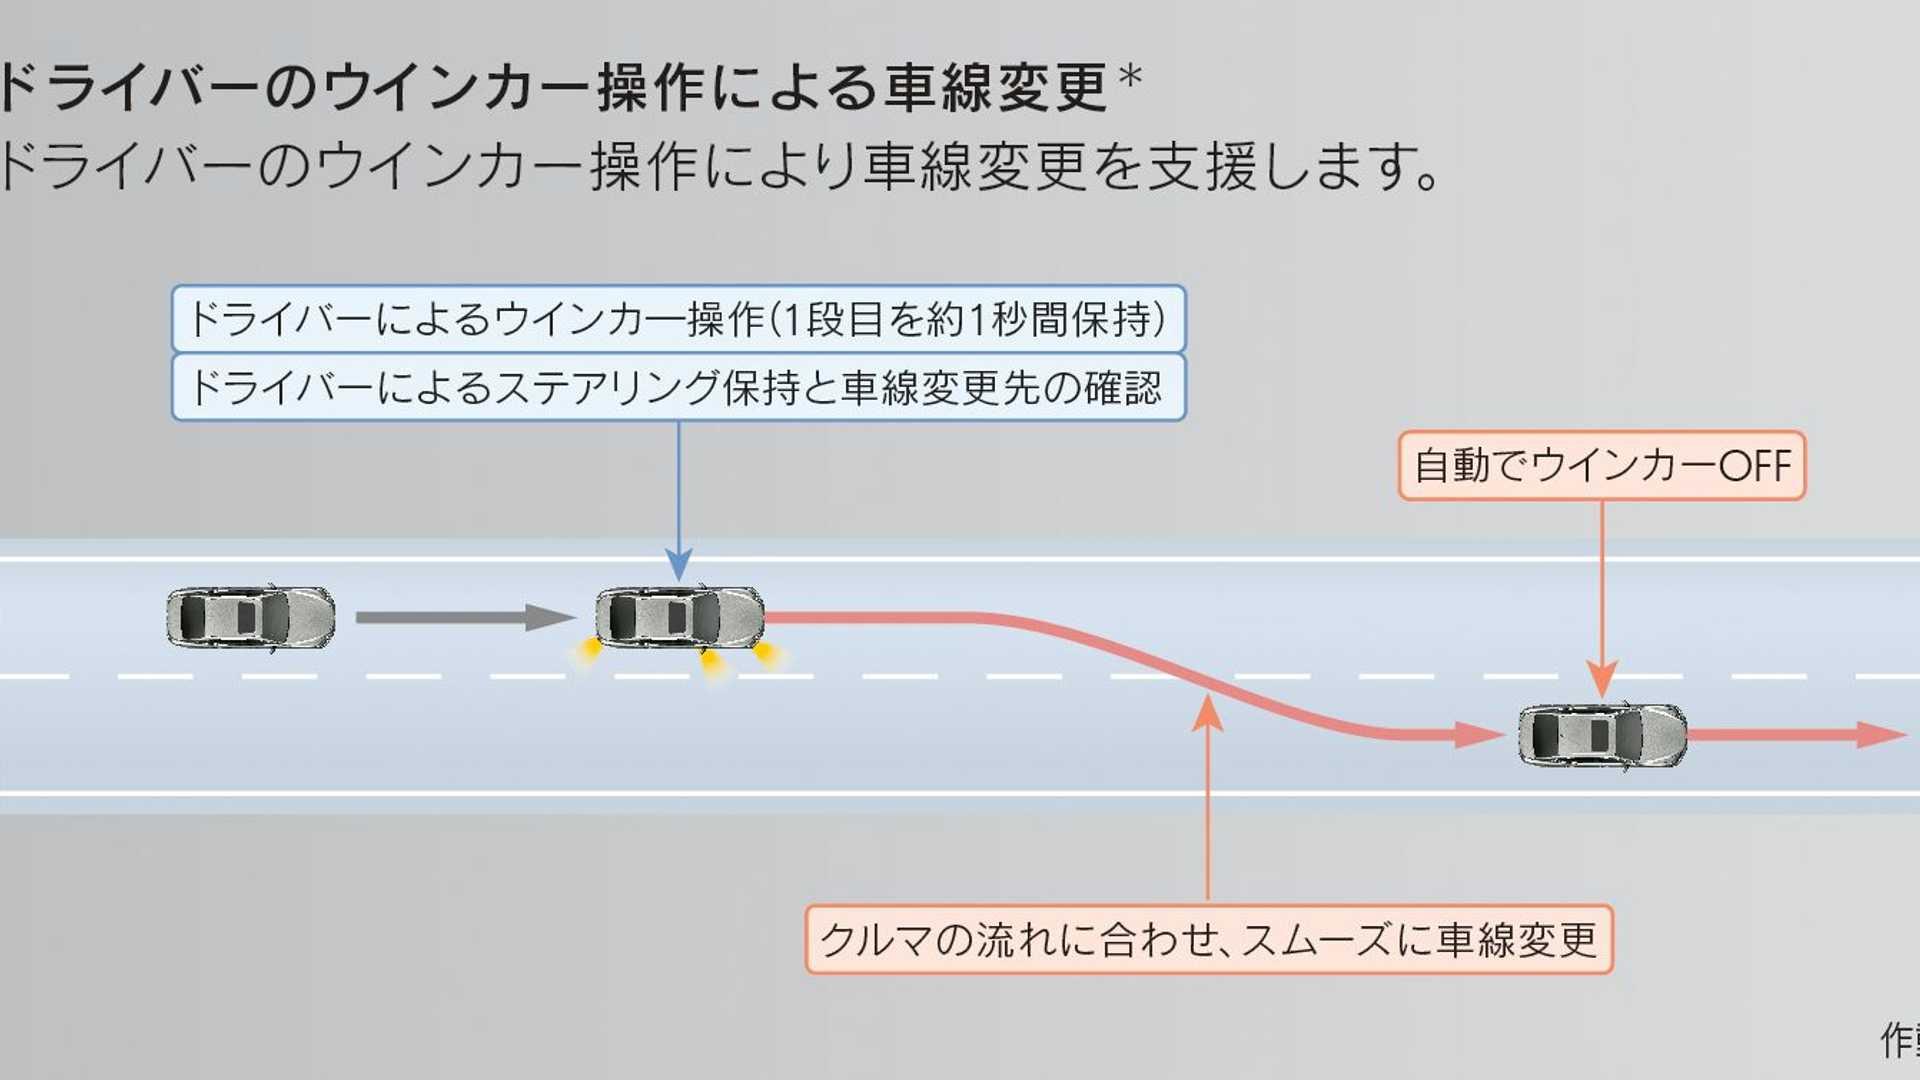 Lexus-LS-And-Toyota-Mirai-Advanced-Drive-30